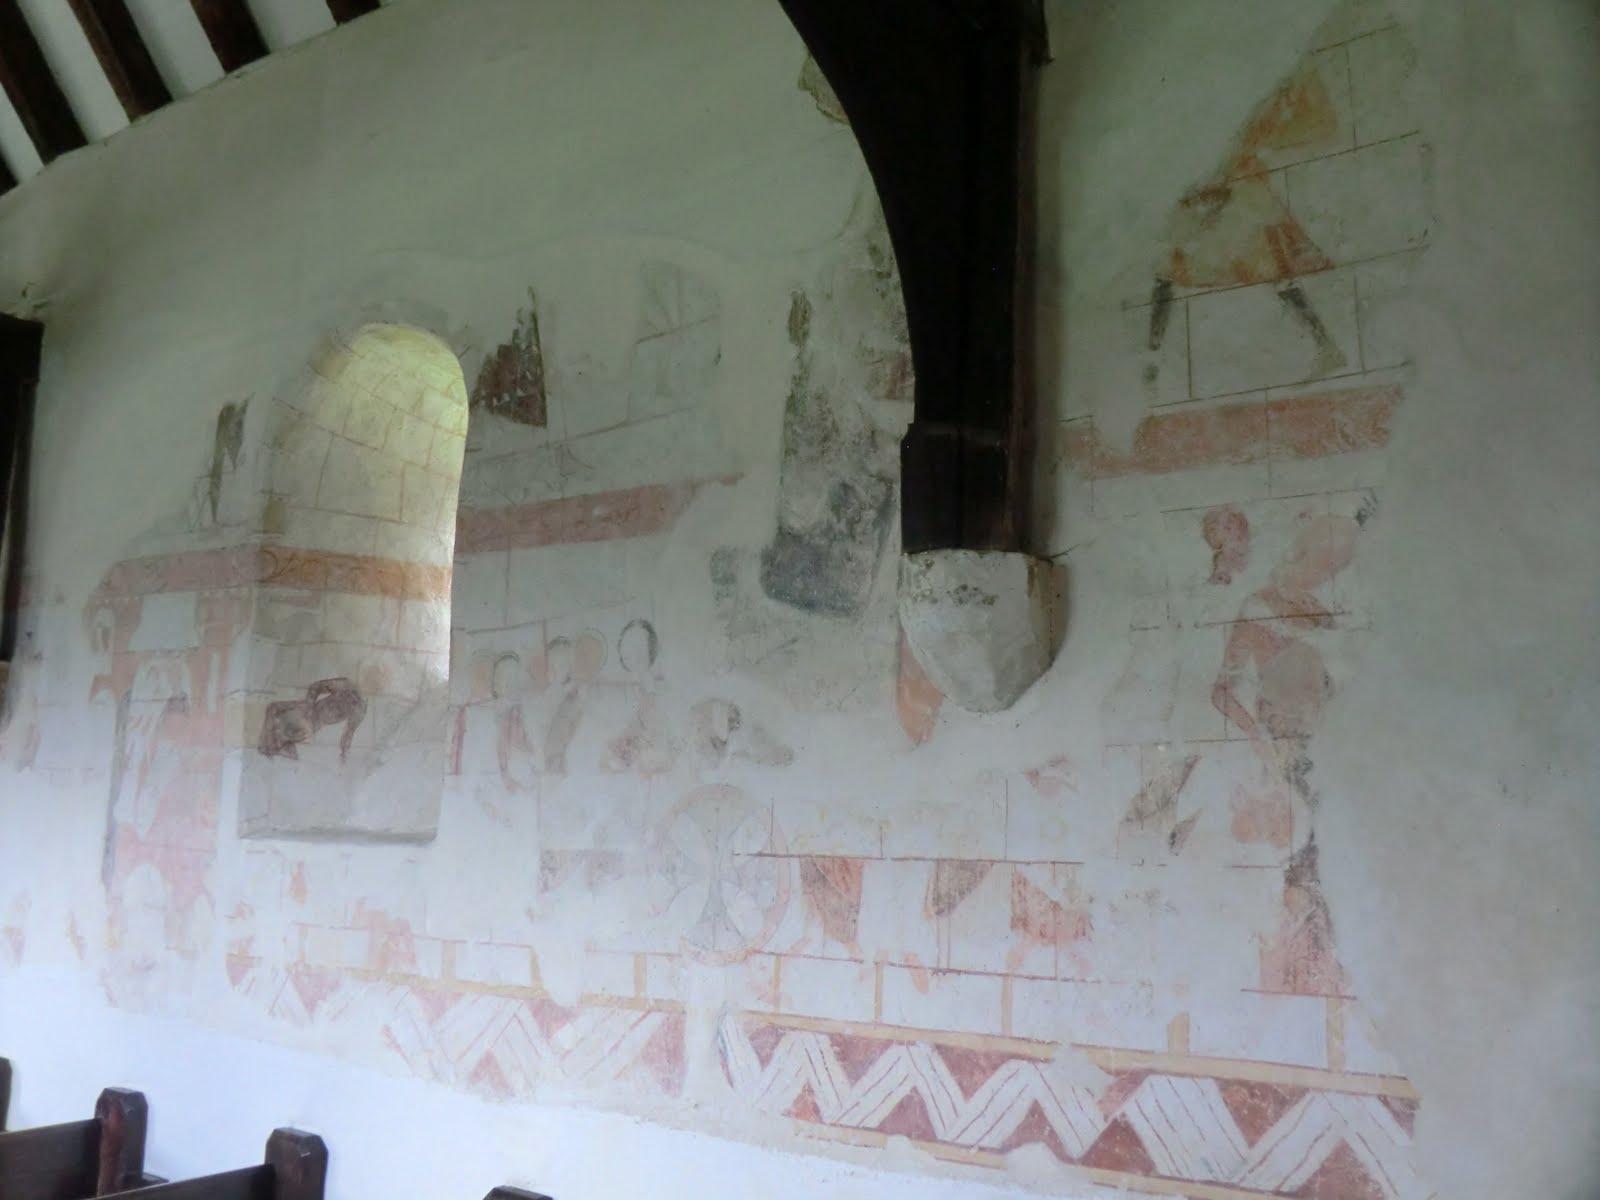 CIMG1604 Wall painting, Capel church